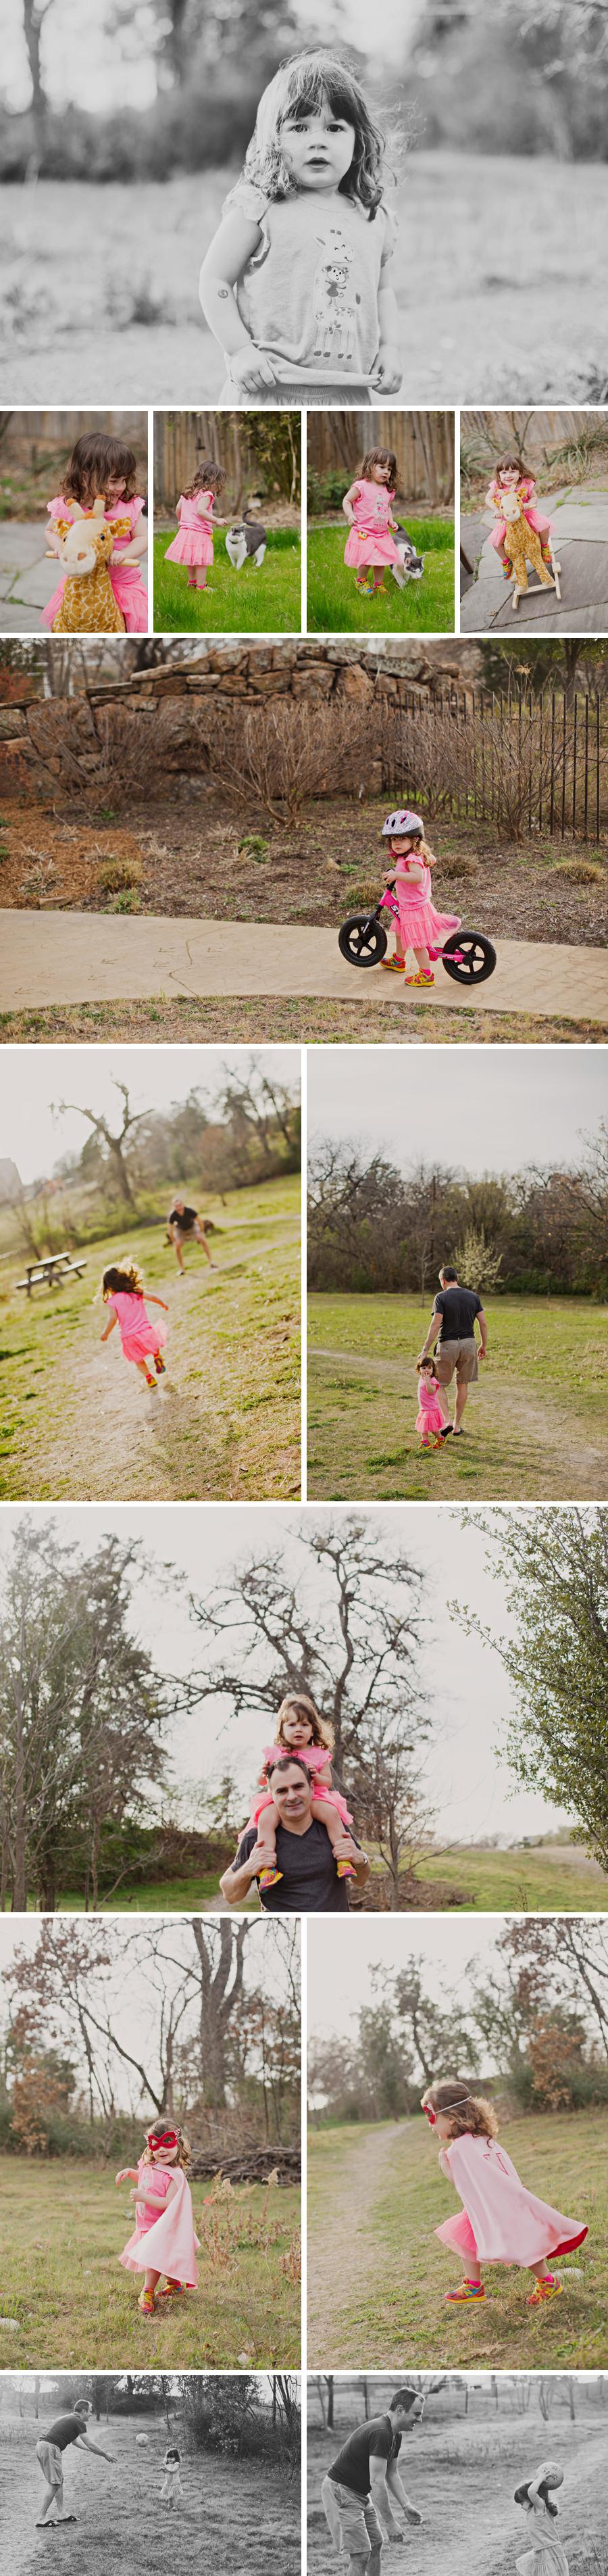 Dallas-Family-Photographerc015